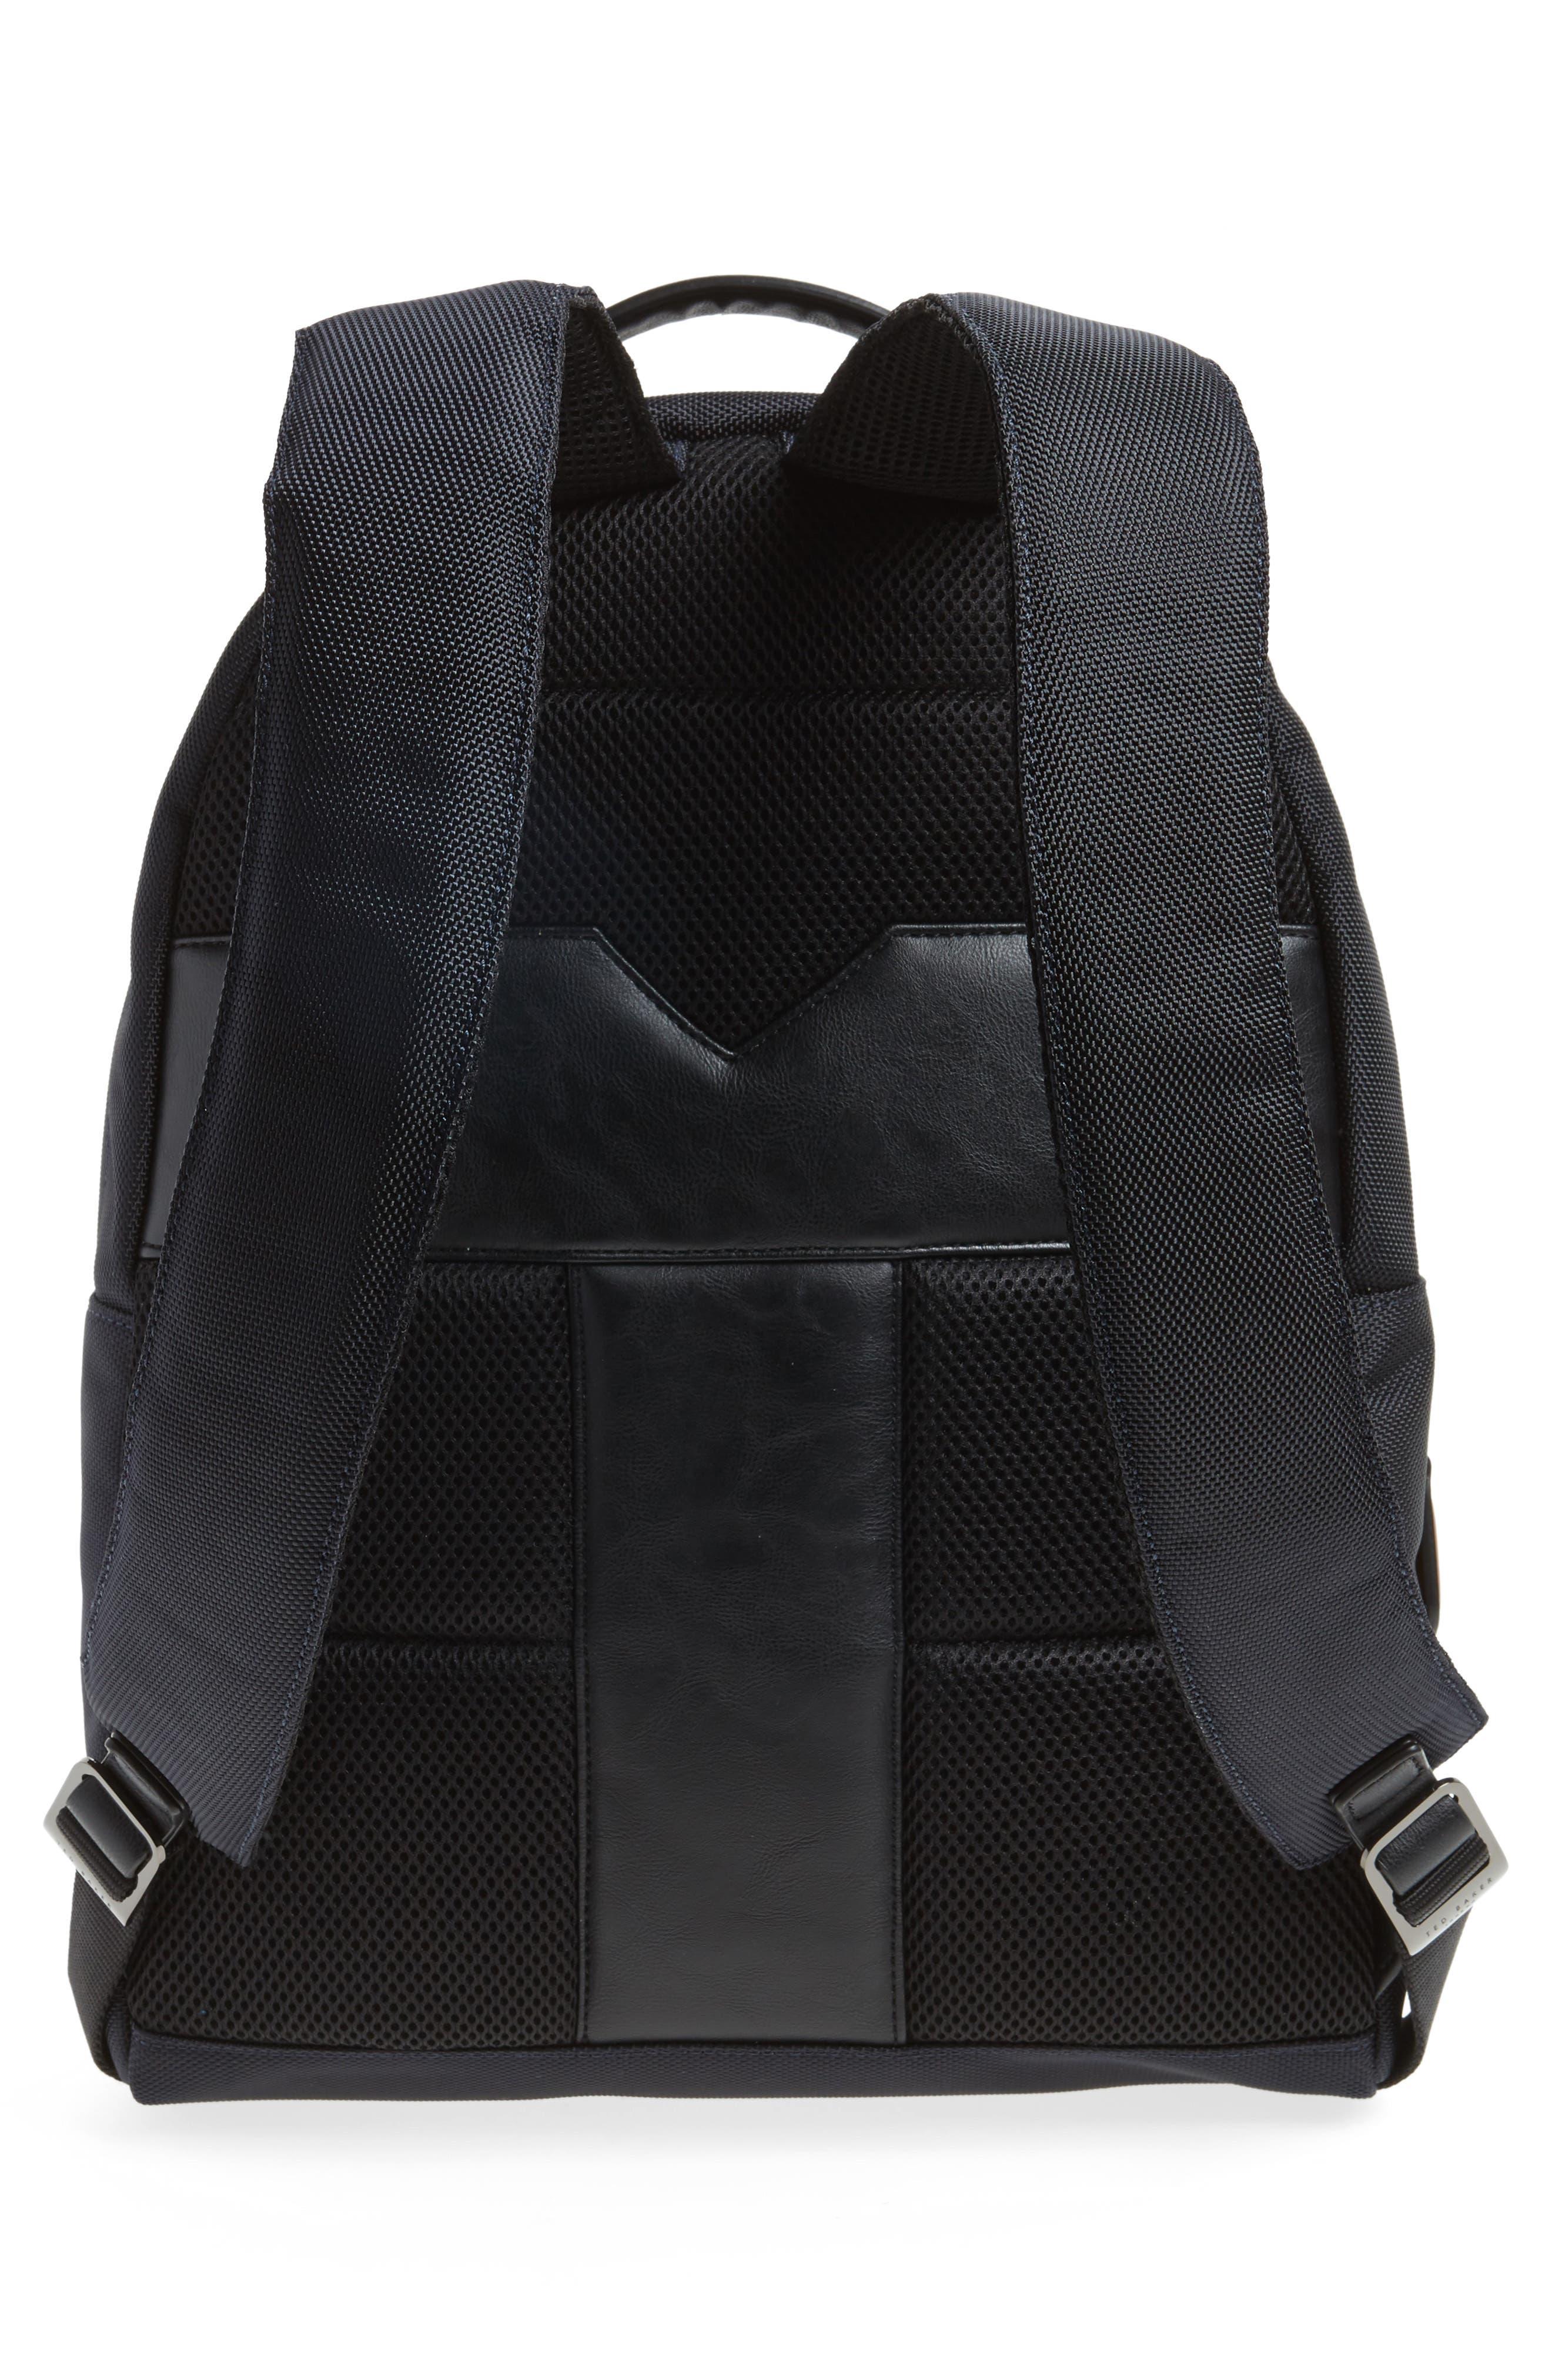 Solaris Backpack,                             Alternate thumbnail 3, color,                             410